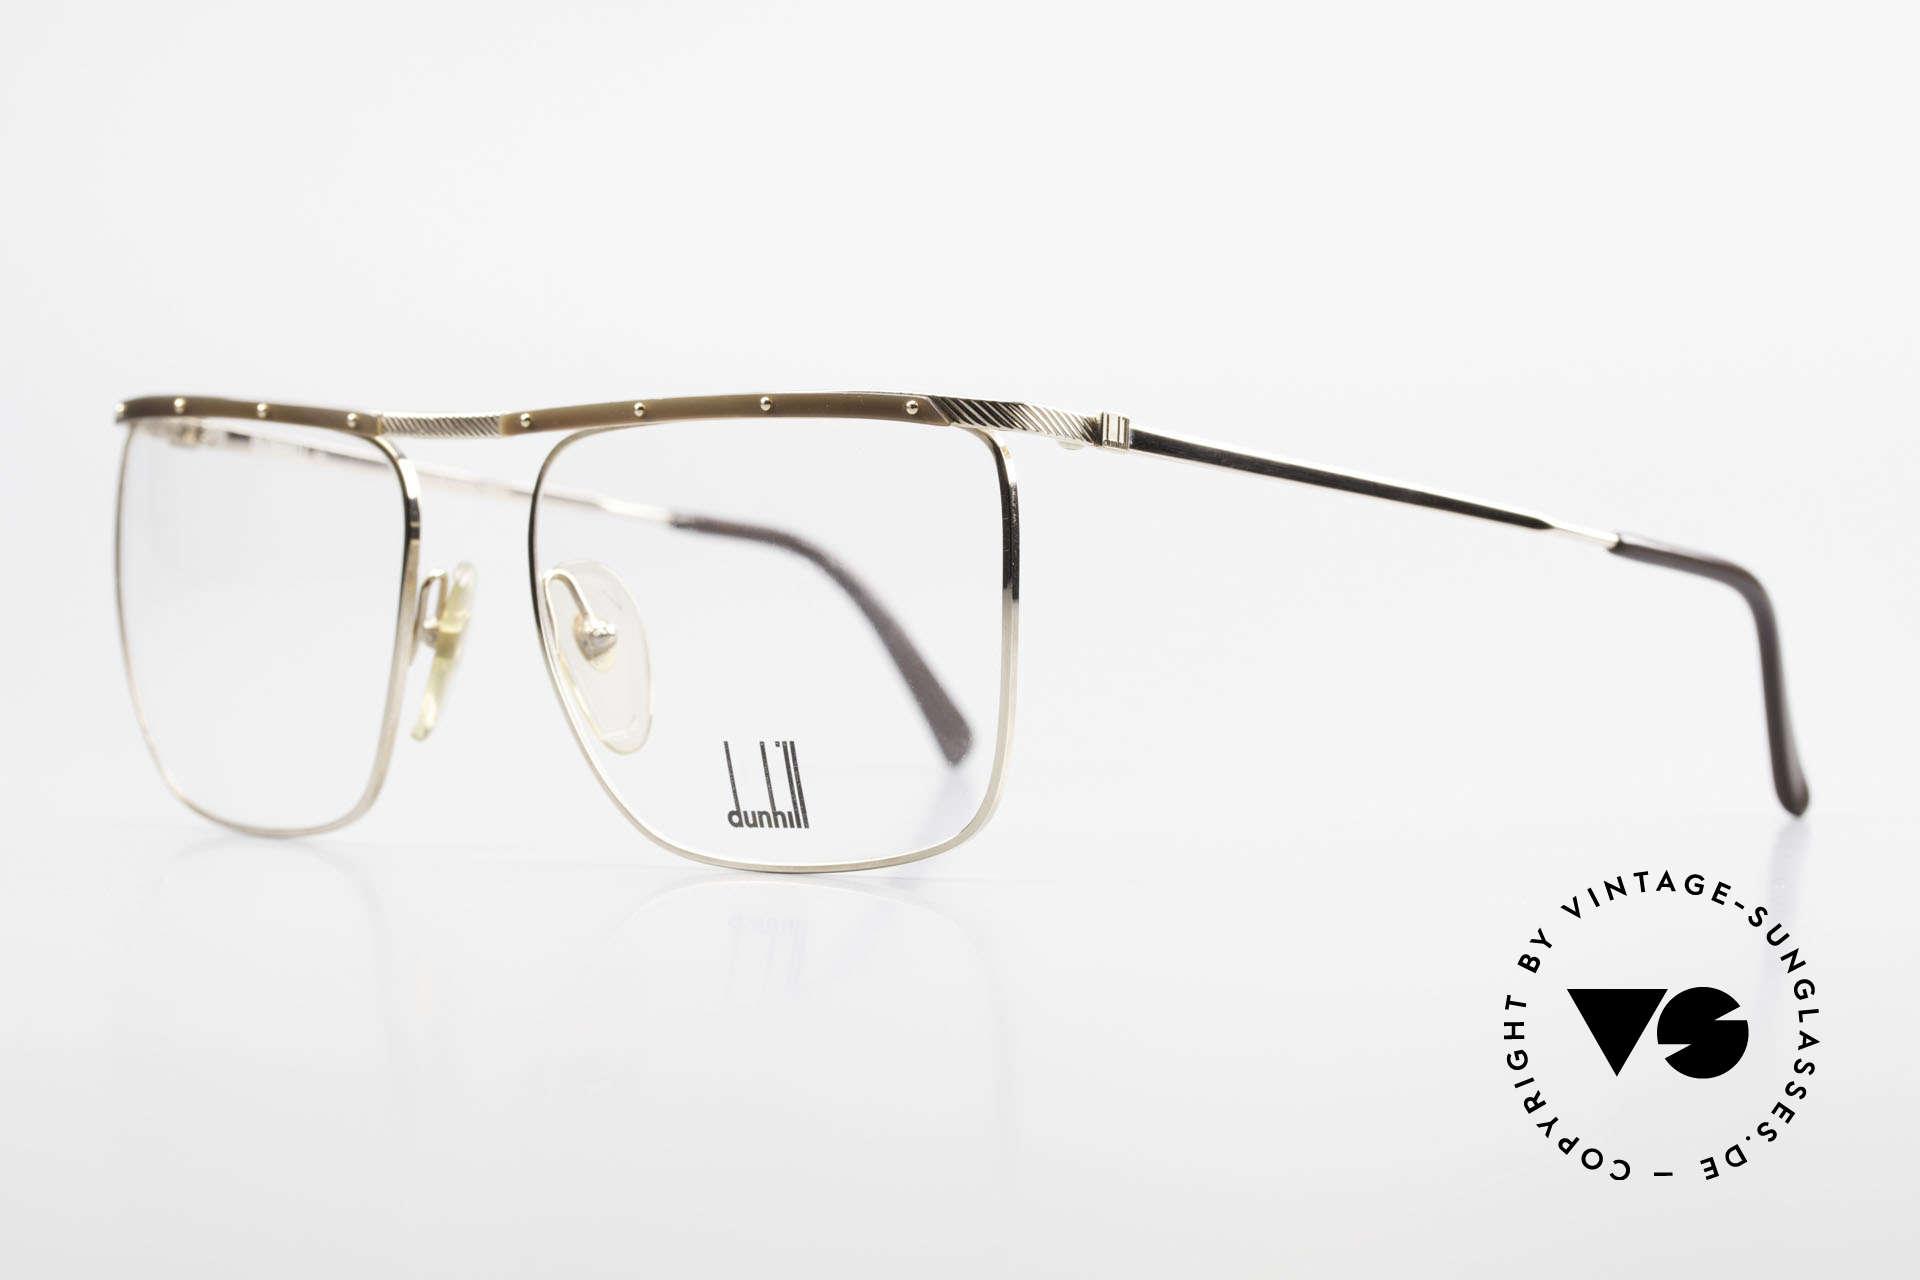 Dunhill 6056 Genuine Horn Trims 80's Frame, timeless, stylish design (real gentleman specs), Made for Men